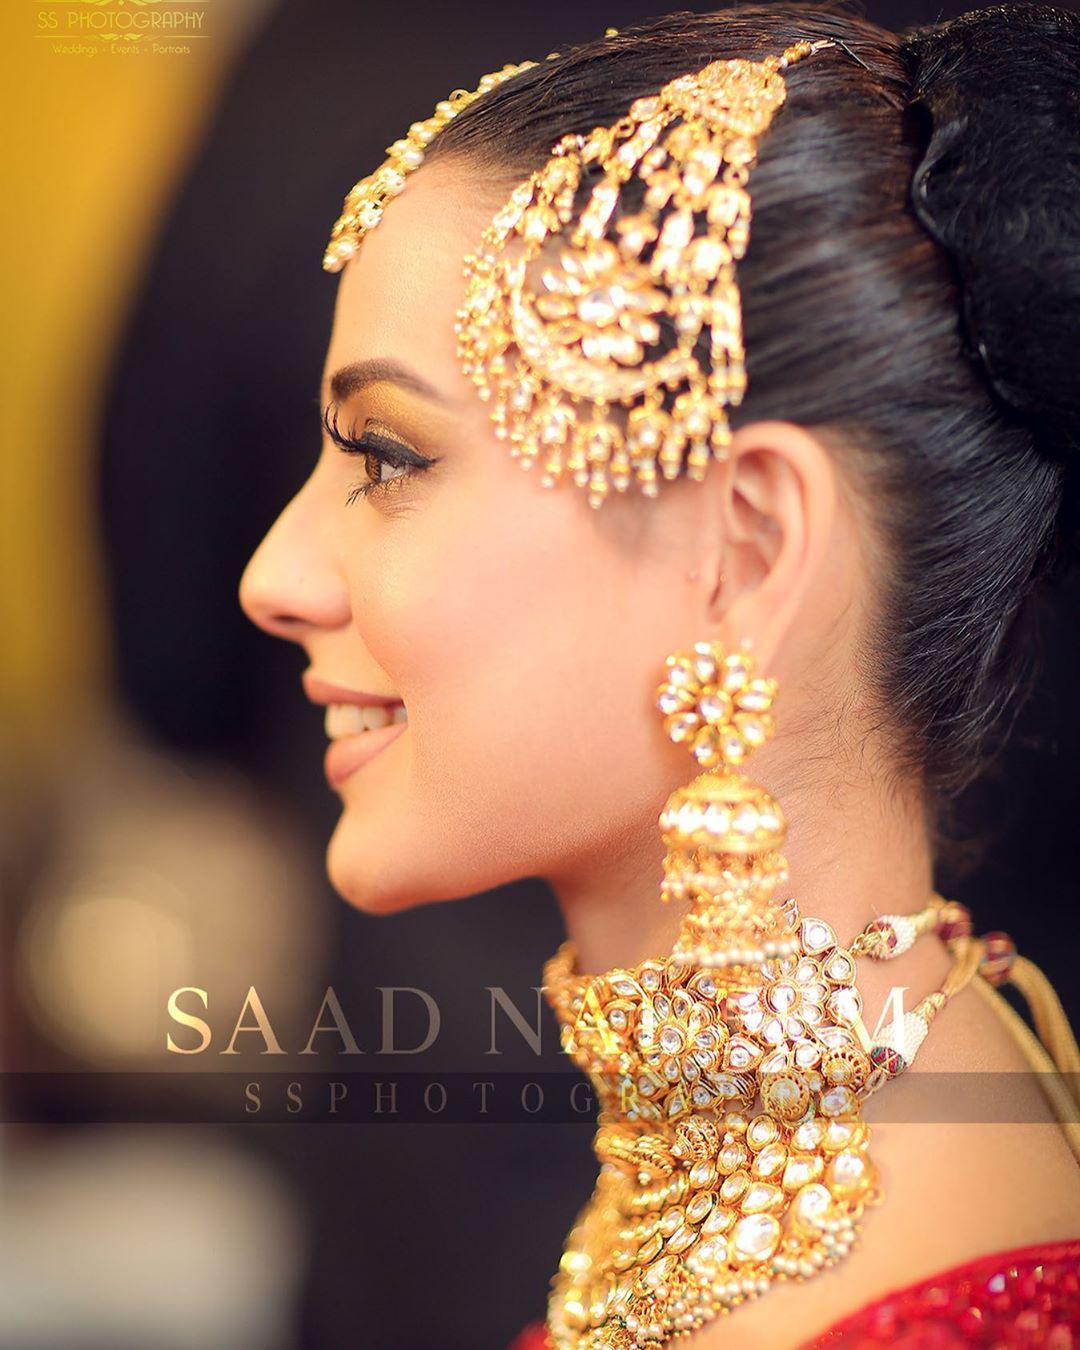 Iqra Aziz and Yasir Hussain Wedding Pictures (6)